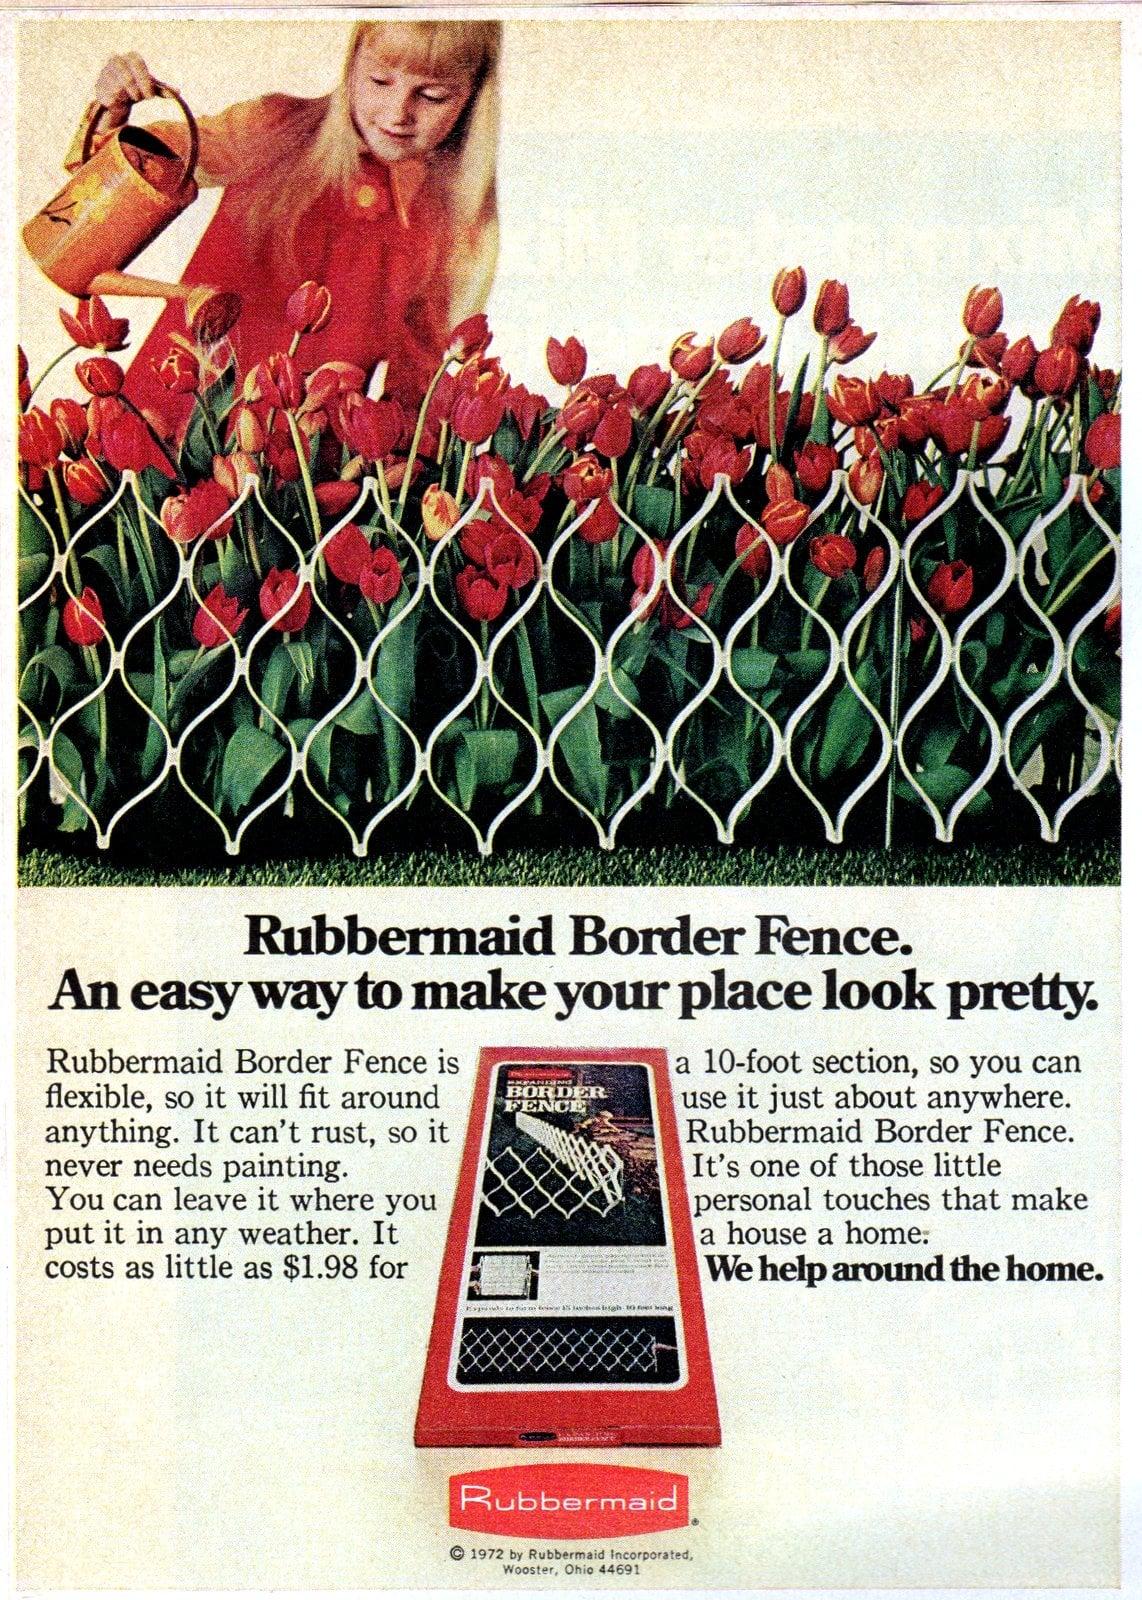 Rubbermaid Border Fence (1972)